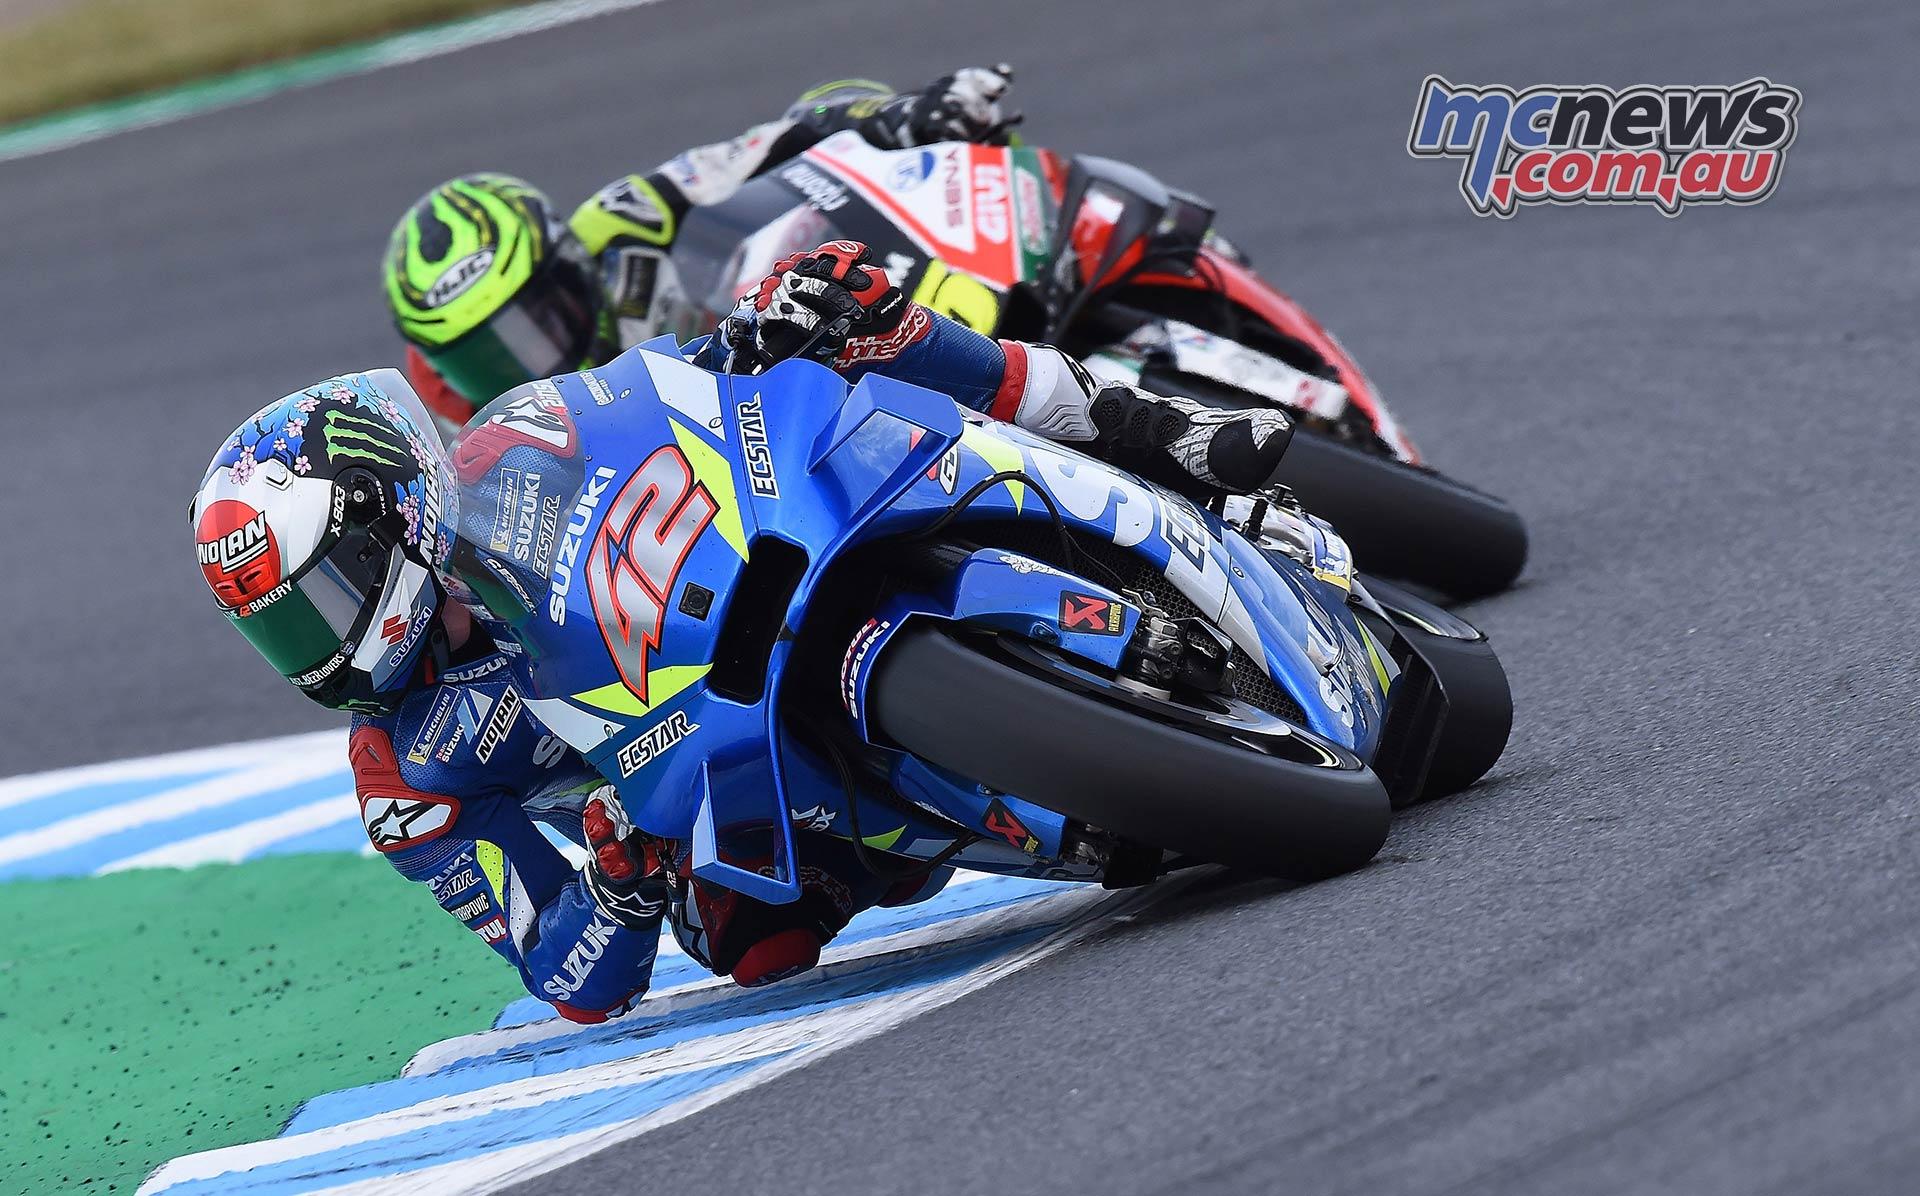 MotoGP Motegi Rins Crutchlow